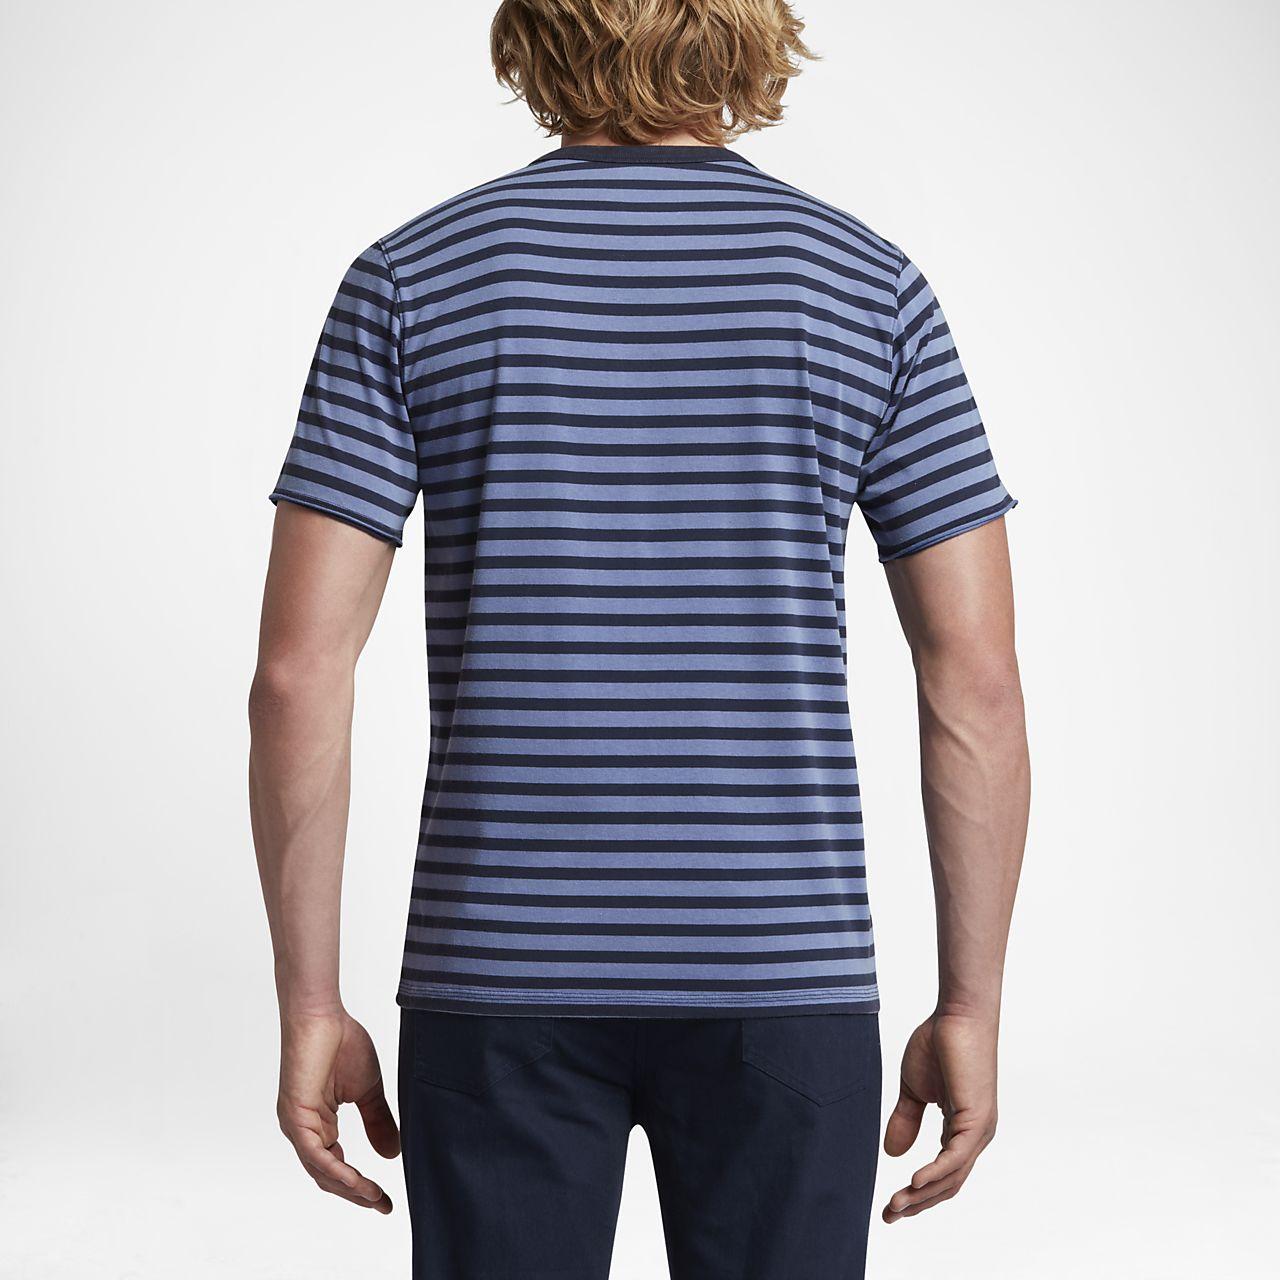 ... Hurley Surf Trip Crew Men's T-Shirt